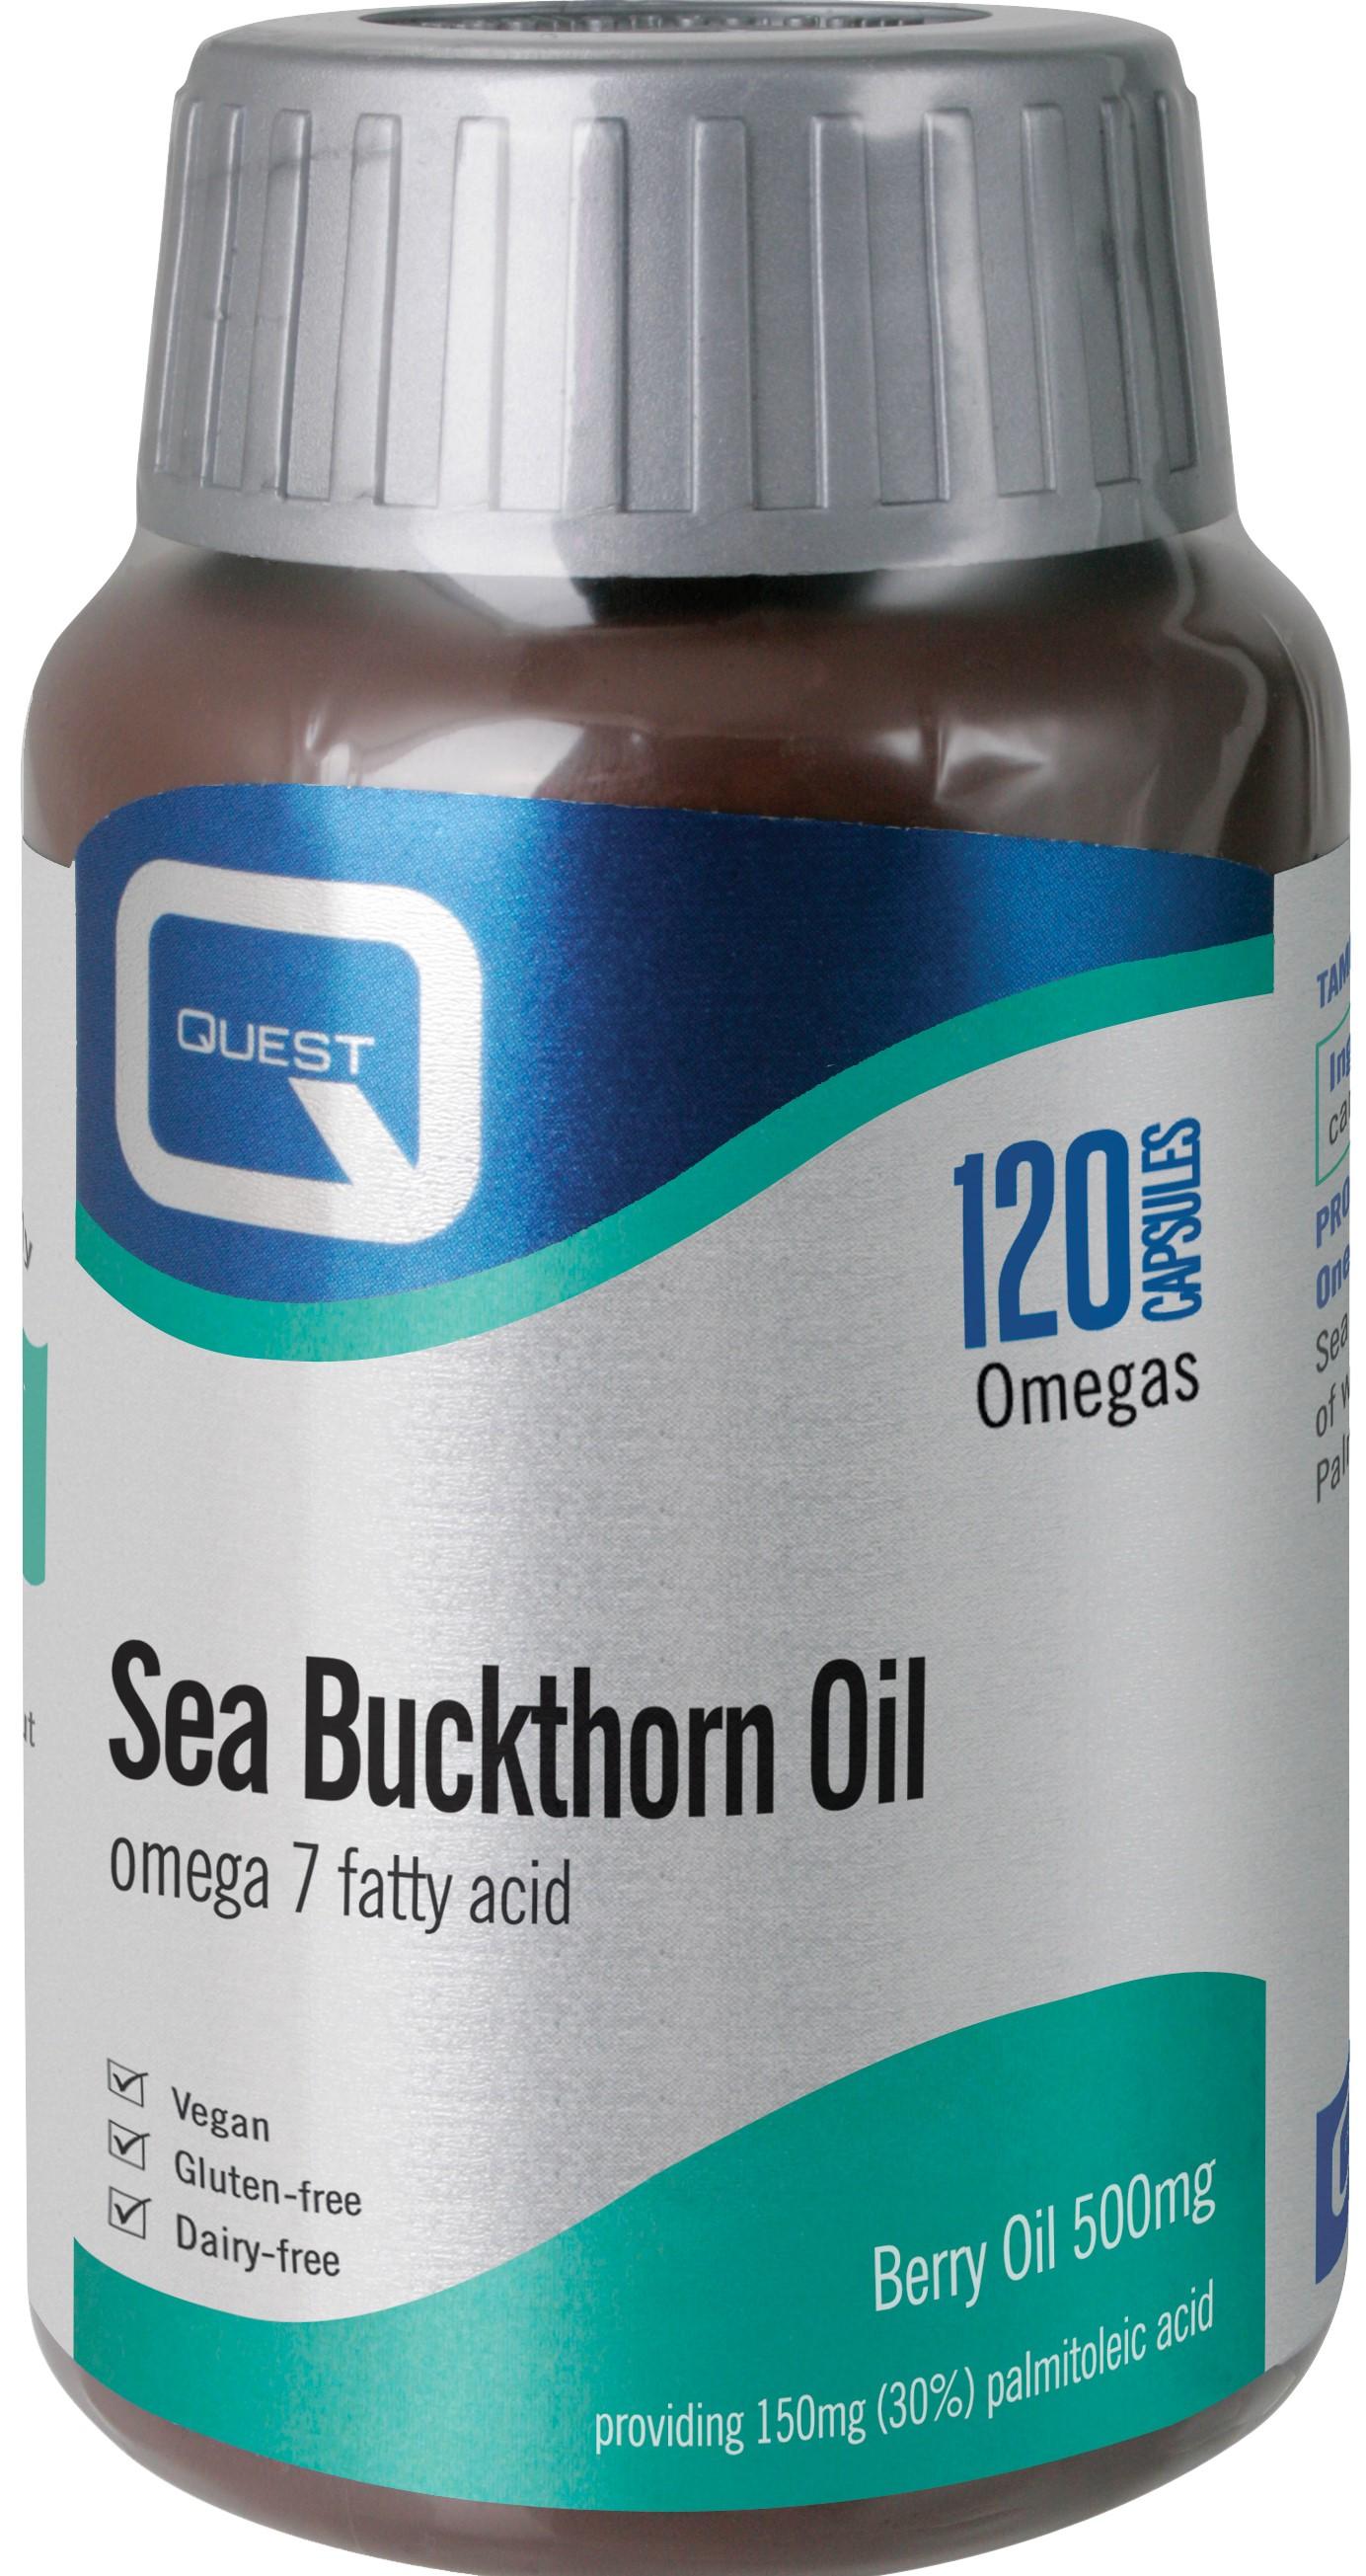 Sea Buckthorn Oil 120's